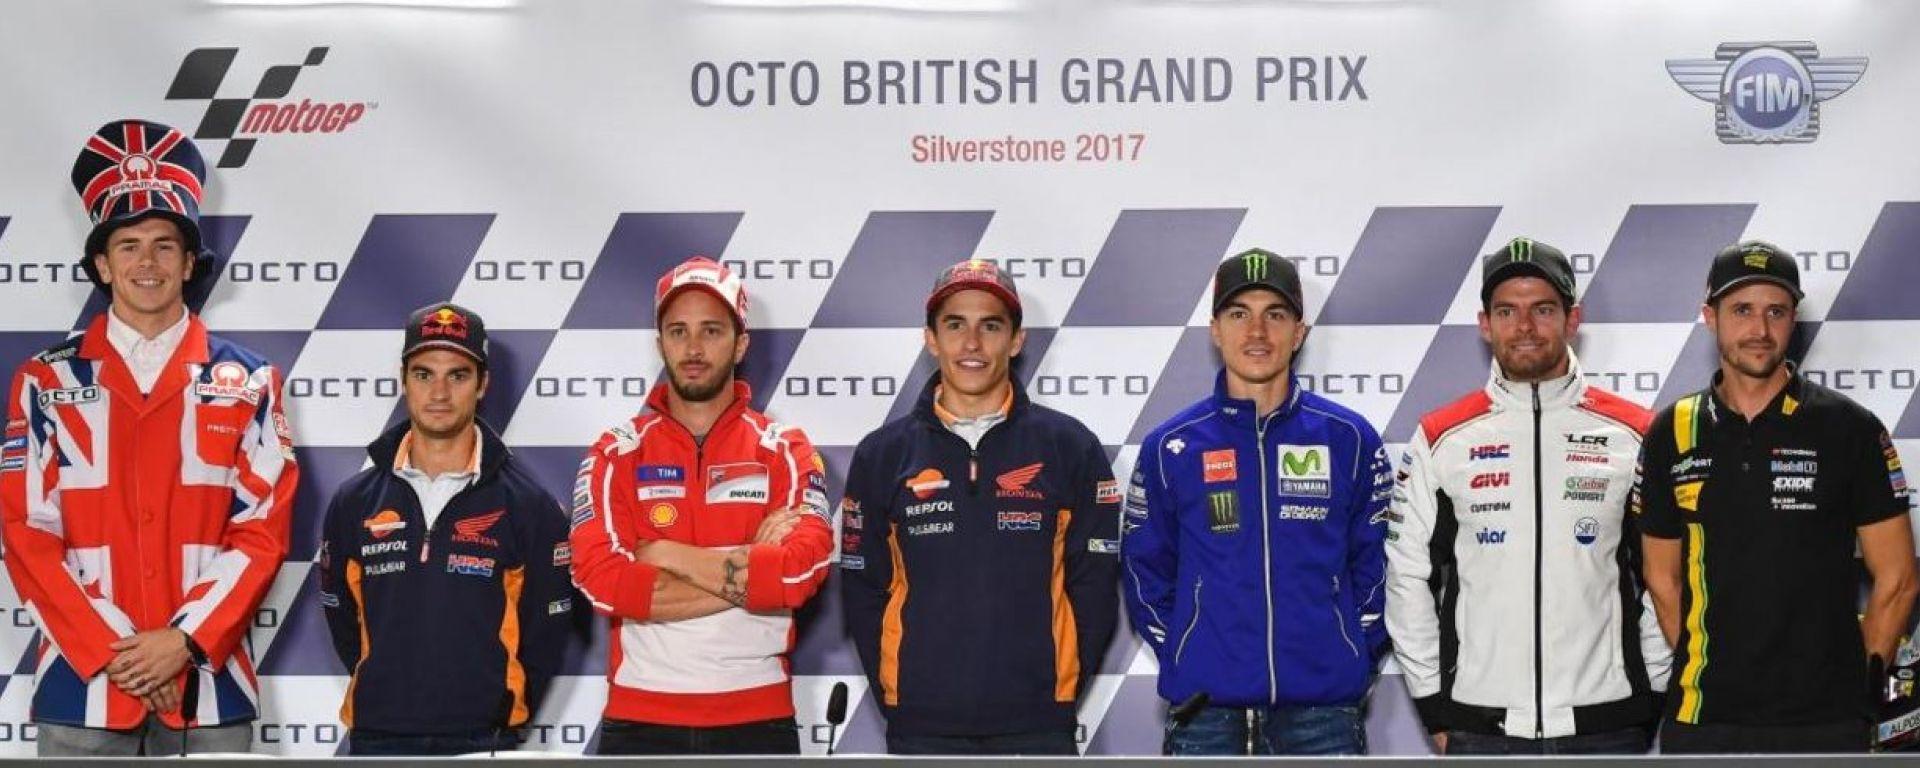 MotoGP Silverstone 2017, conferenza stampa